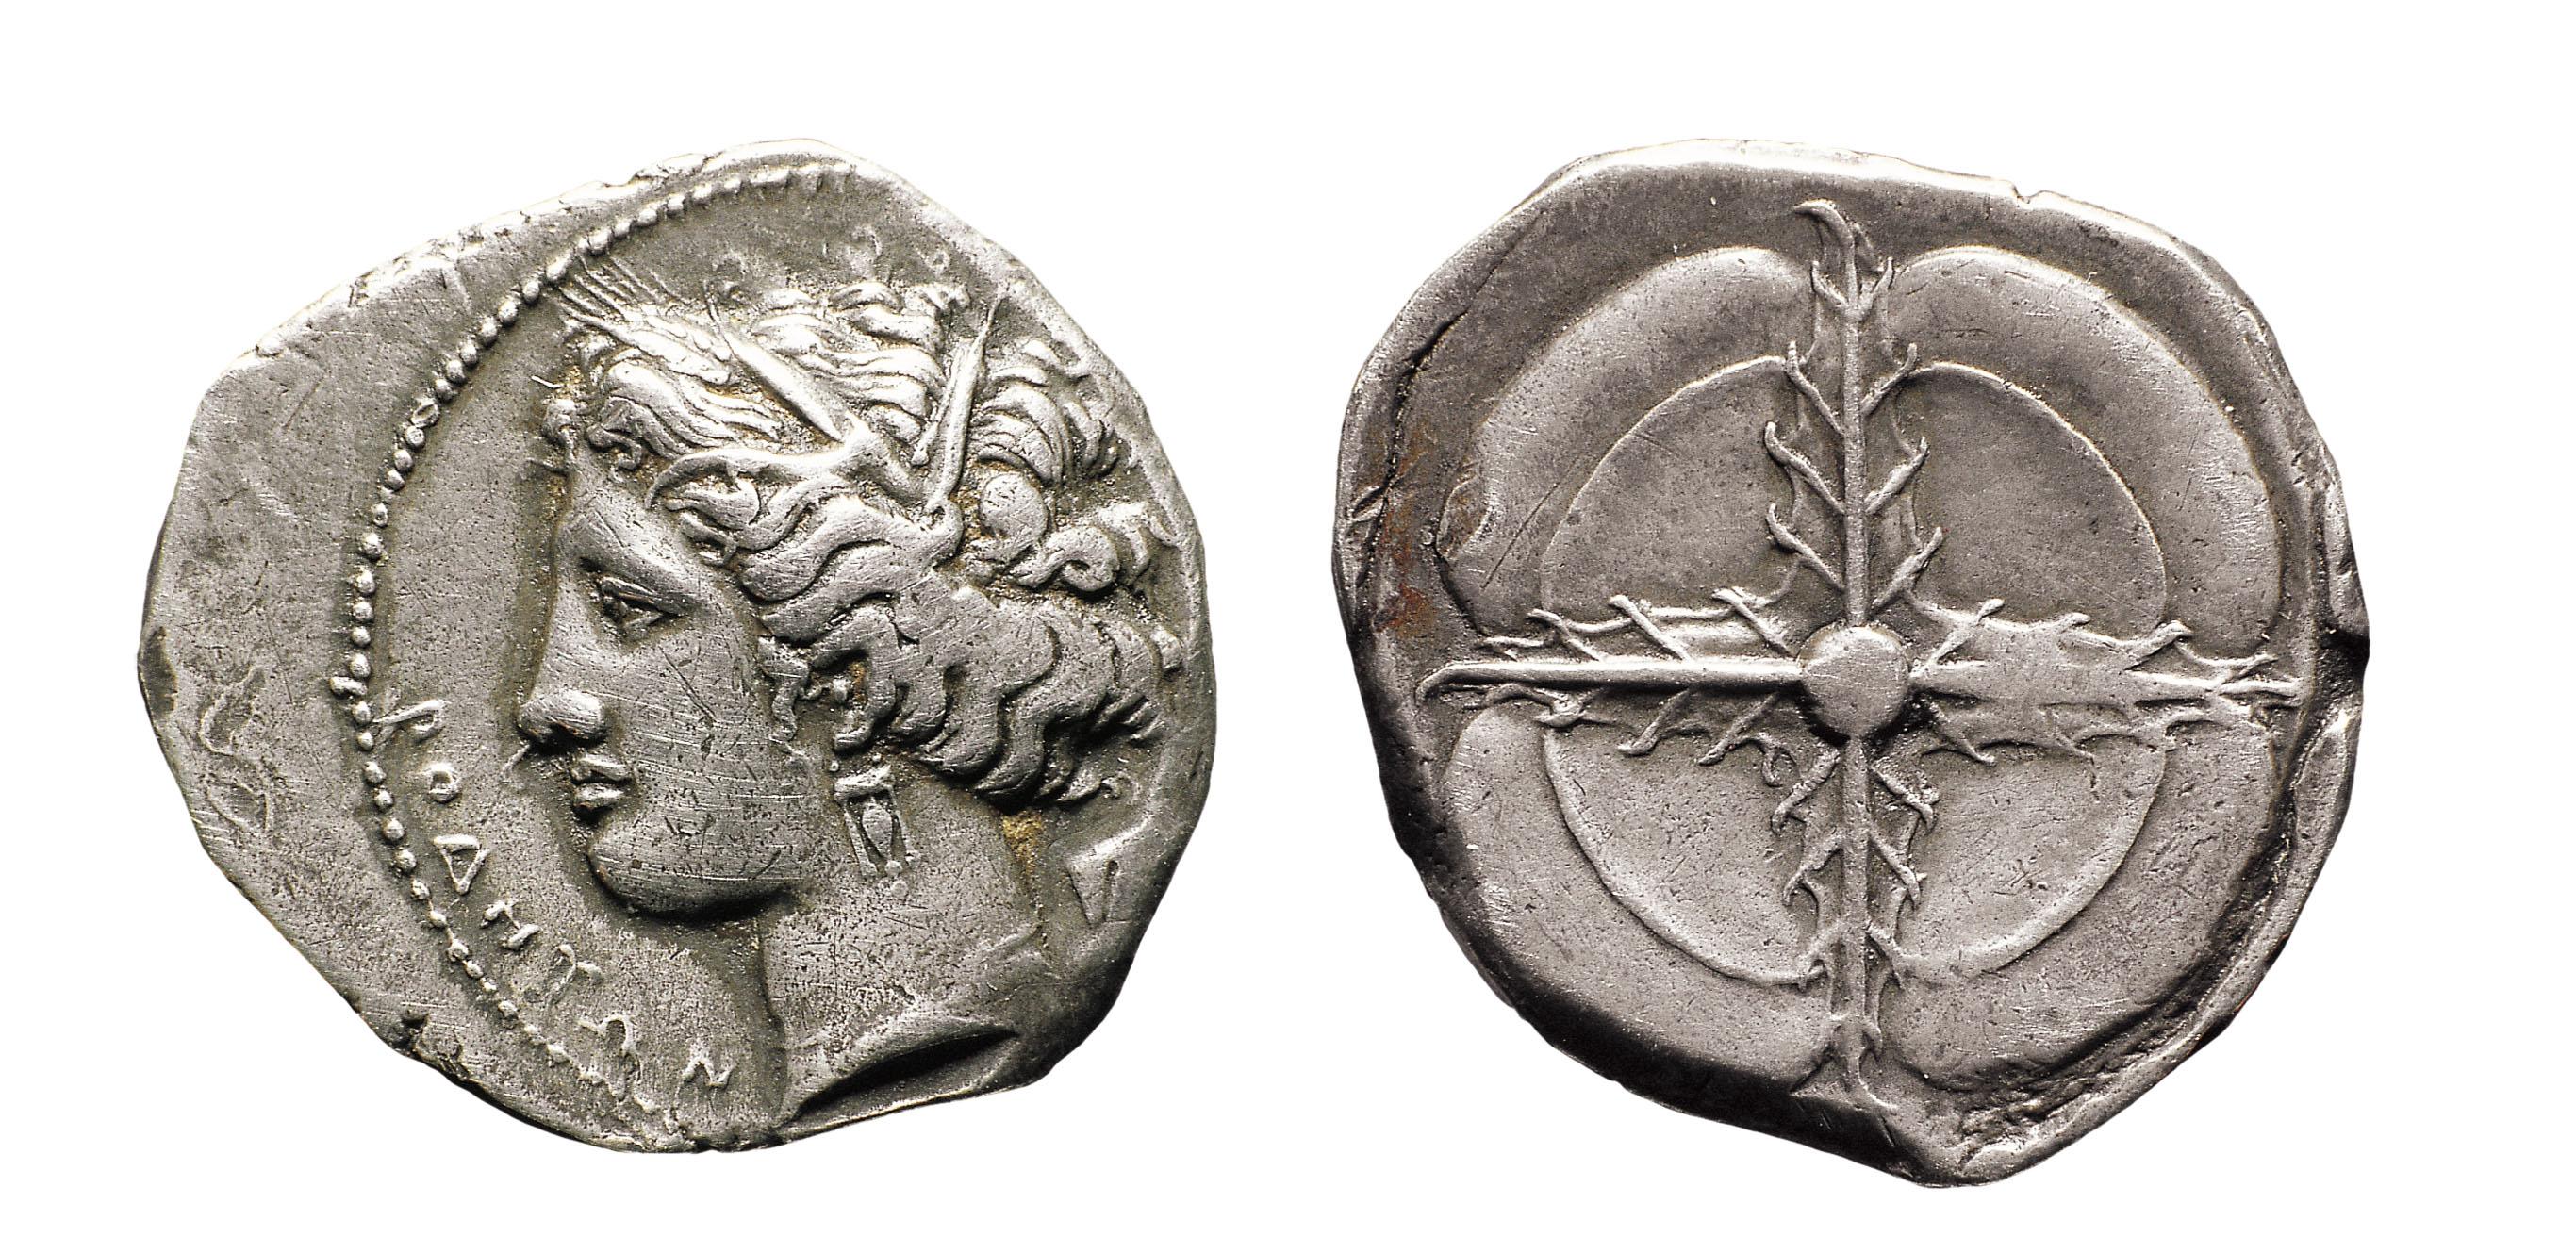 Rhode - Dracma - Primer terç del segle III aC